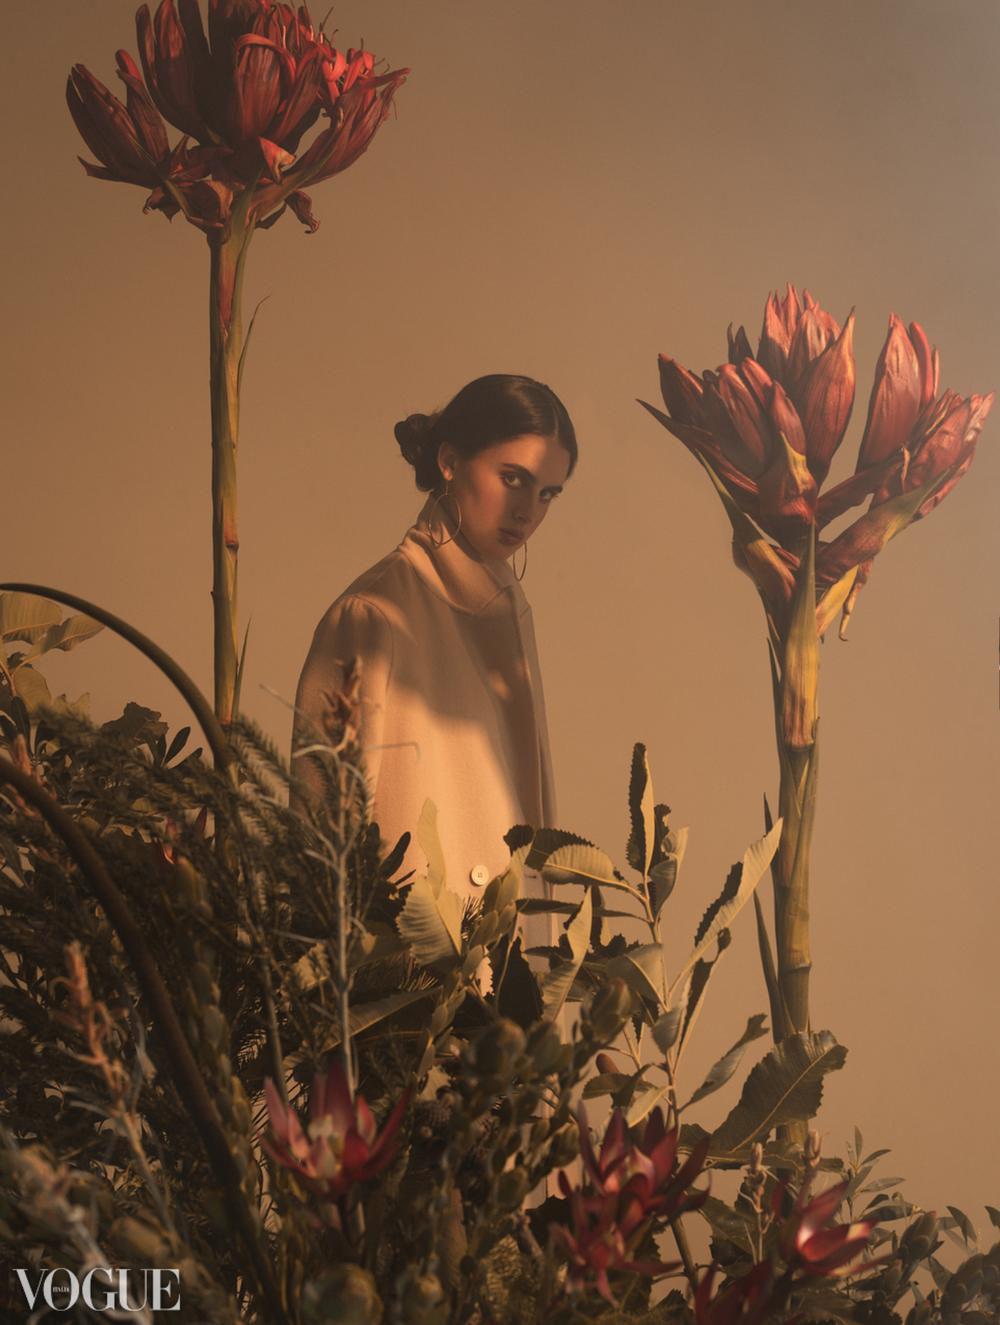 Eden - Vogue Italia (Photovogue)